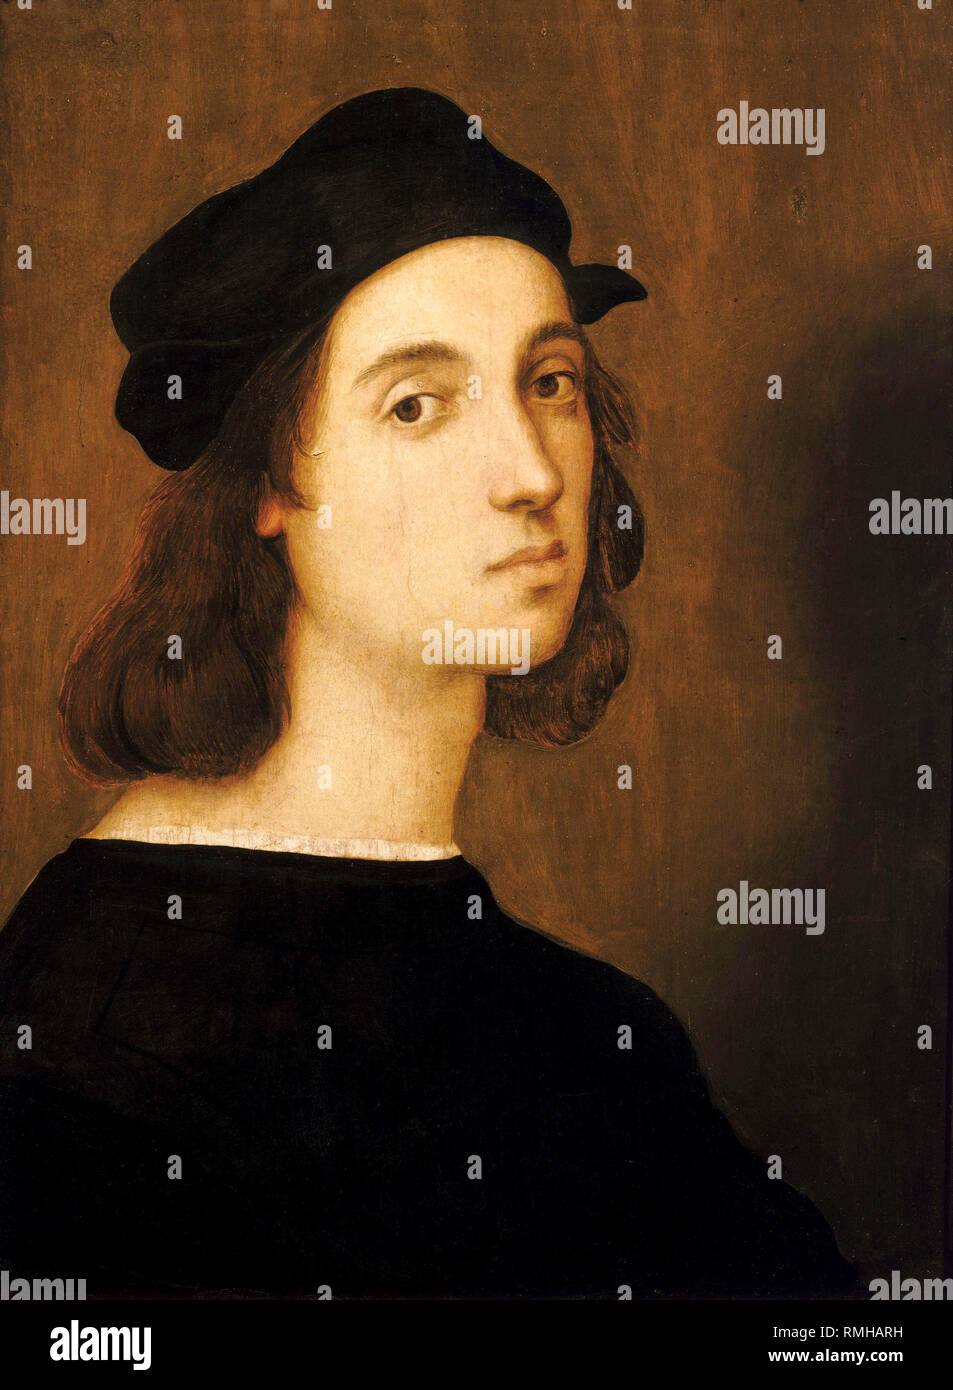 Raphael, portrait of Raffaello Sanzio da Urbino (1483 – 1520), Italian artist painter - Stock Image